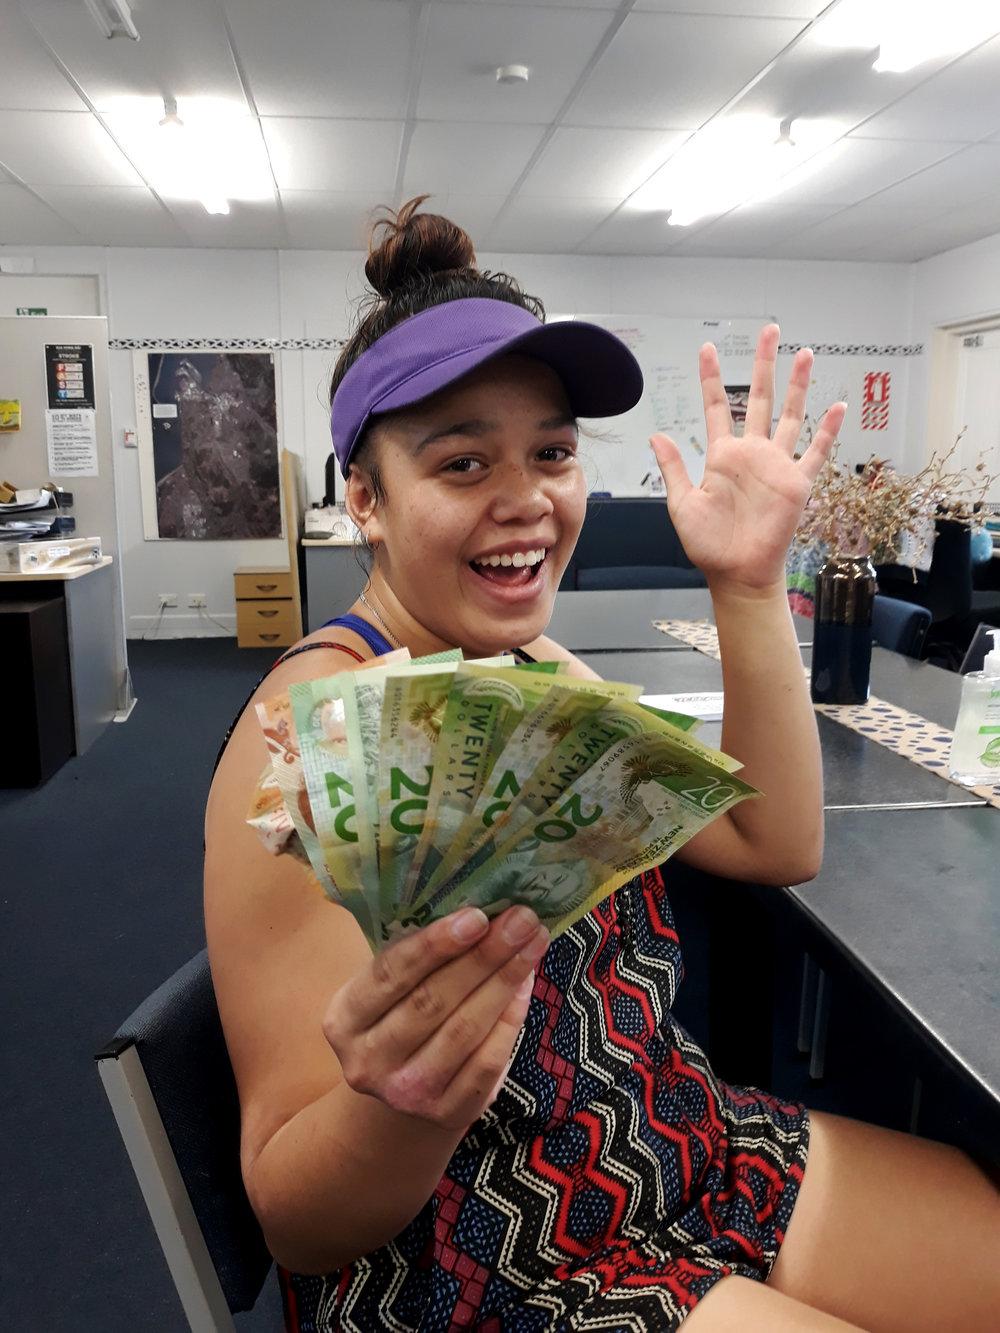 Waimaria showing off her hard earned cash from car washing